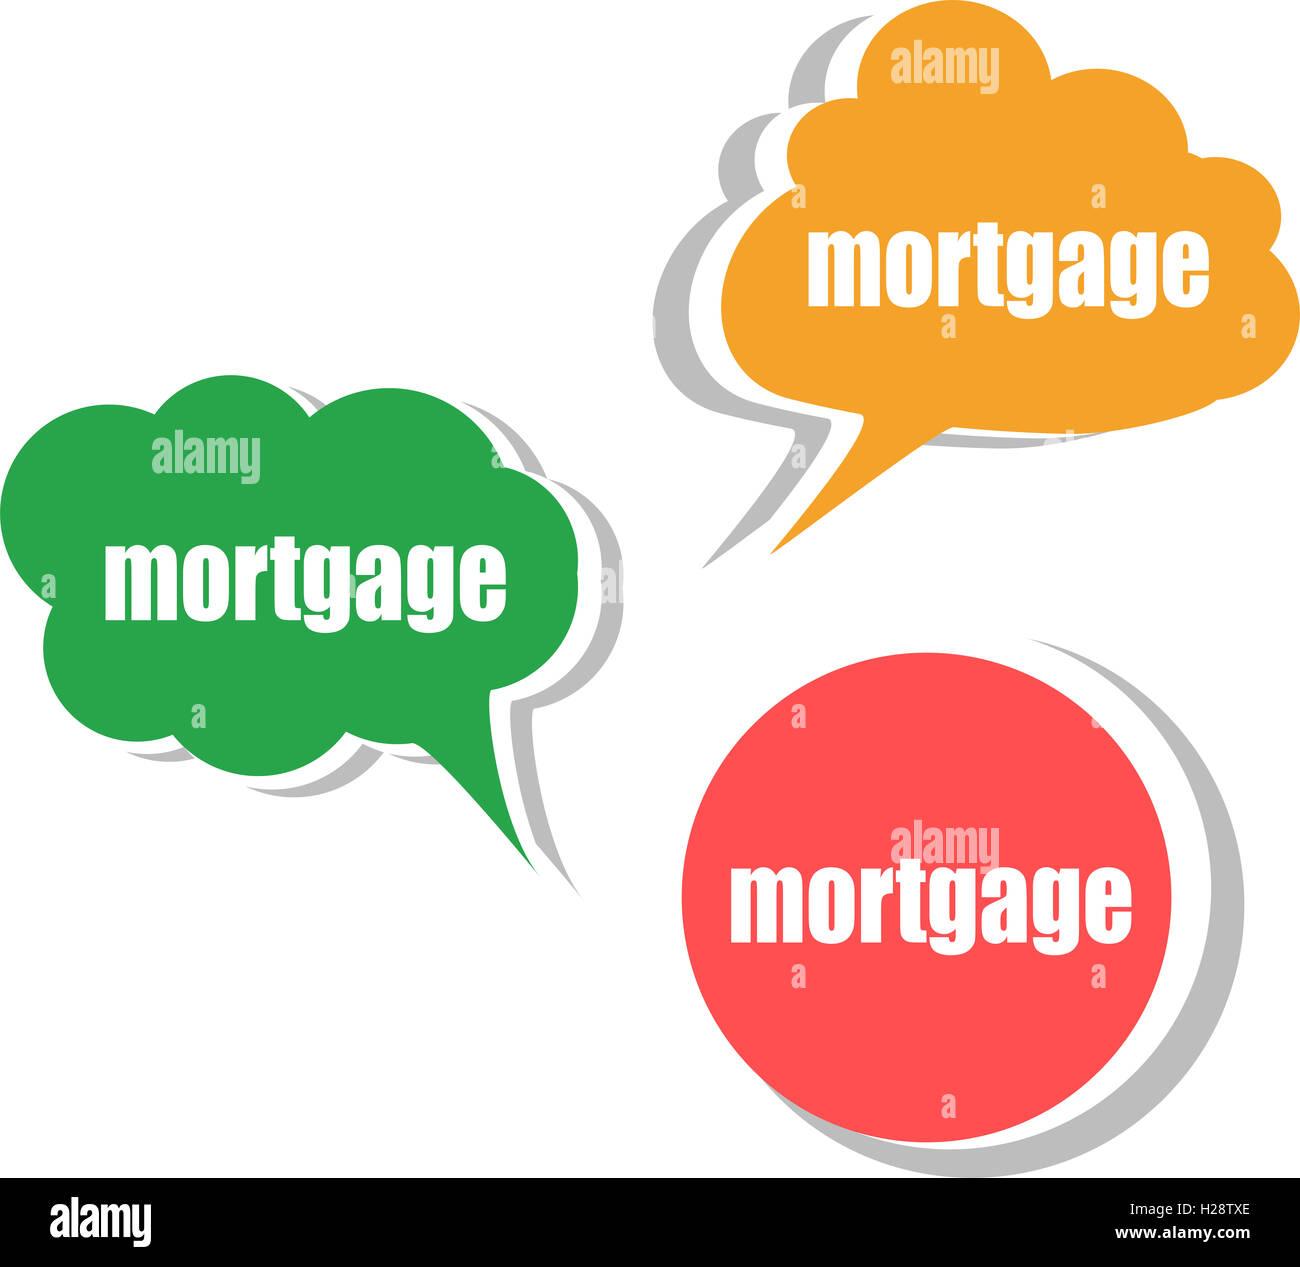 Mortgage Word Cloud Stockfotos & Mortgage Word Cloud Bilder - Alamy